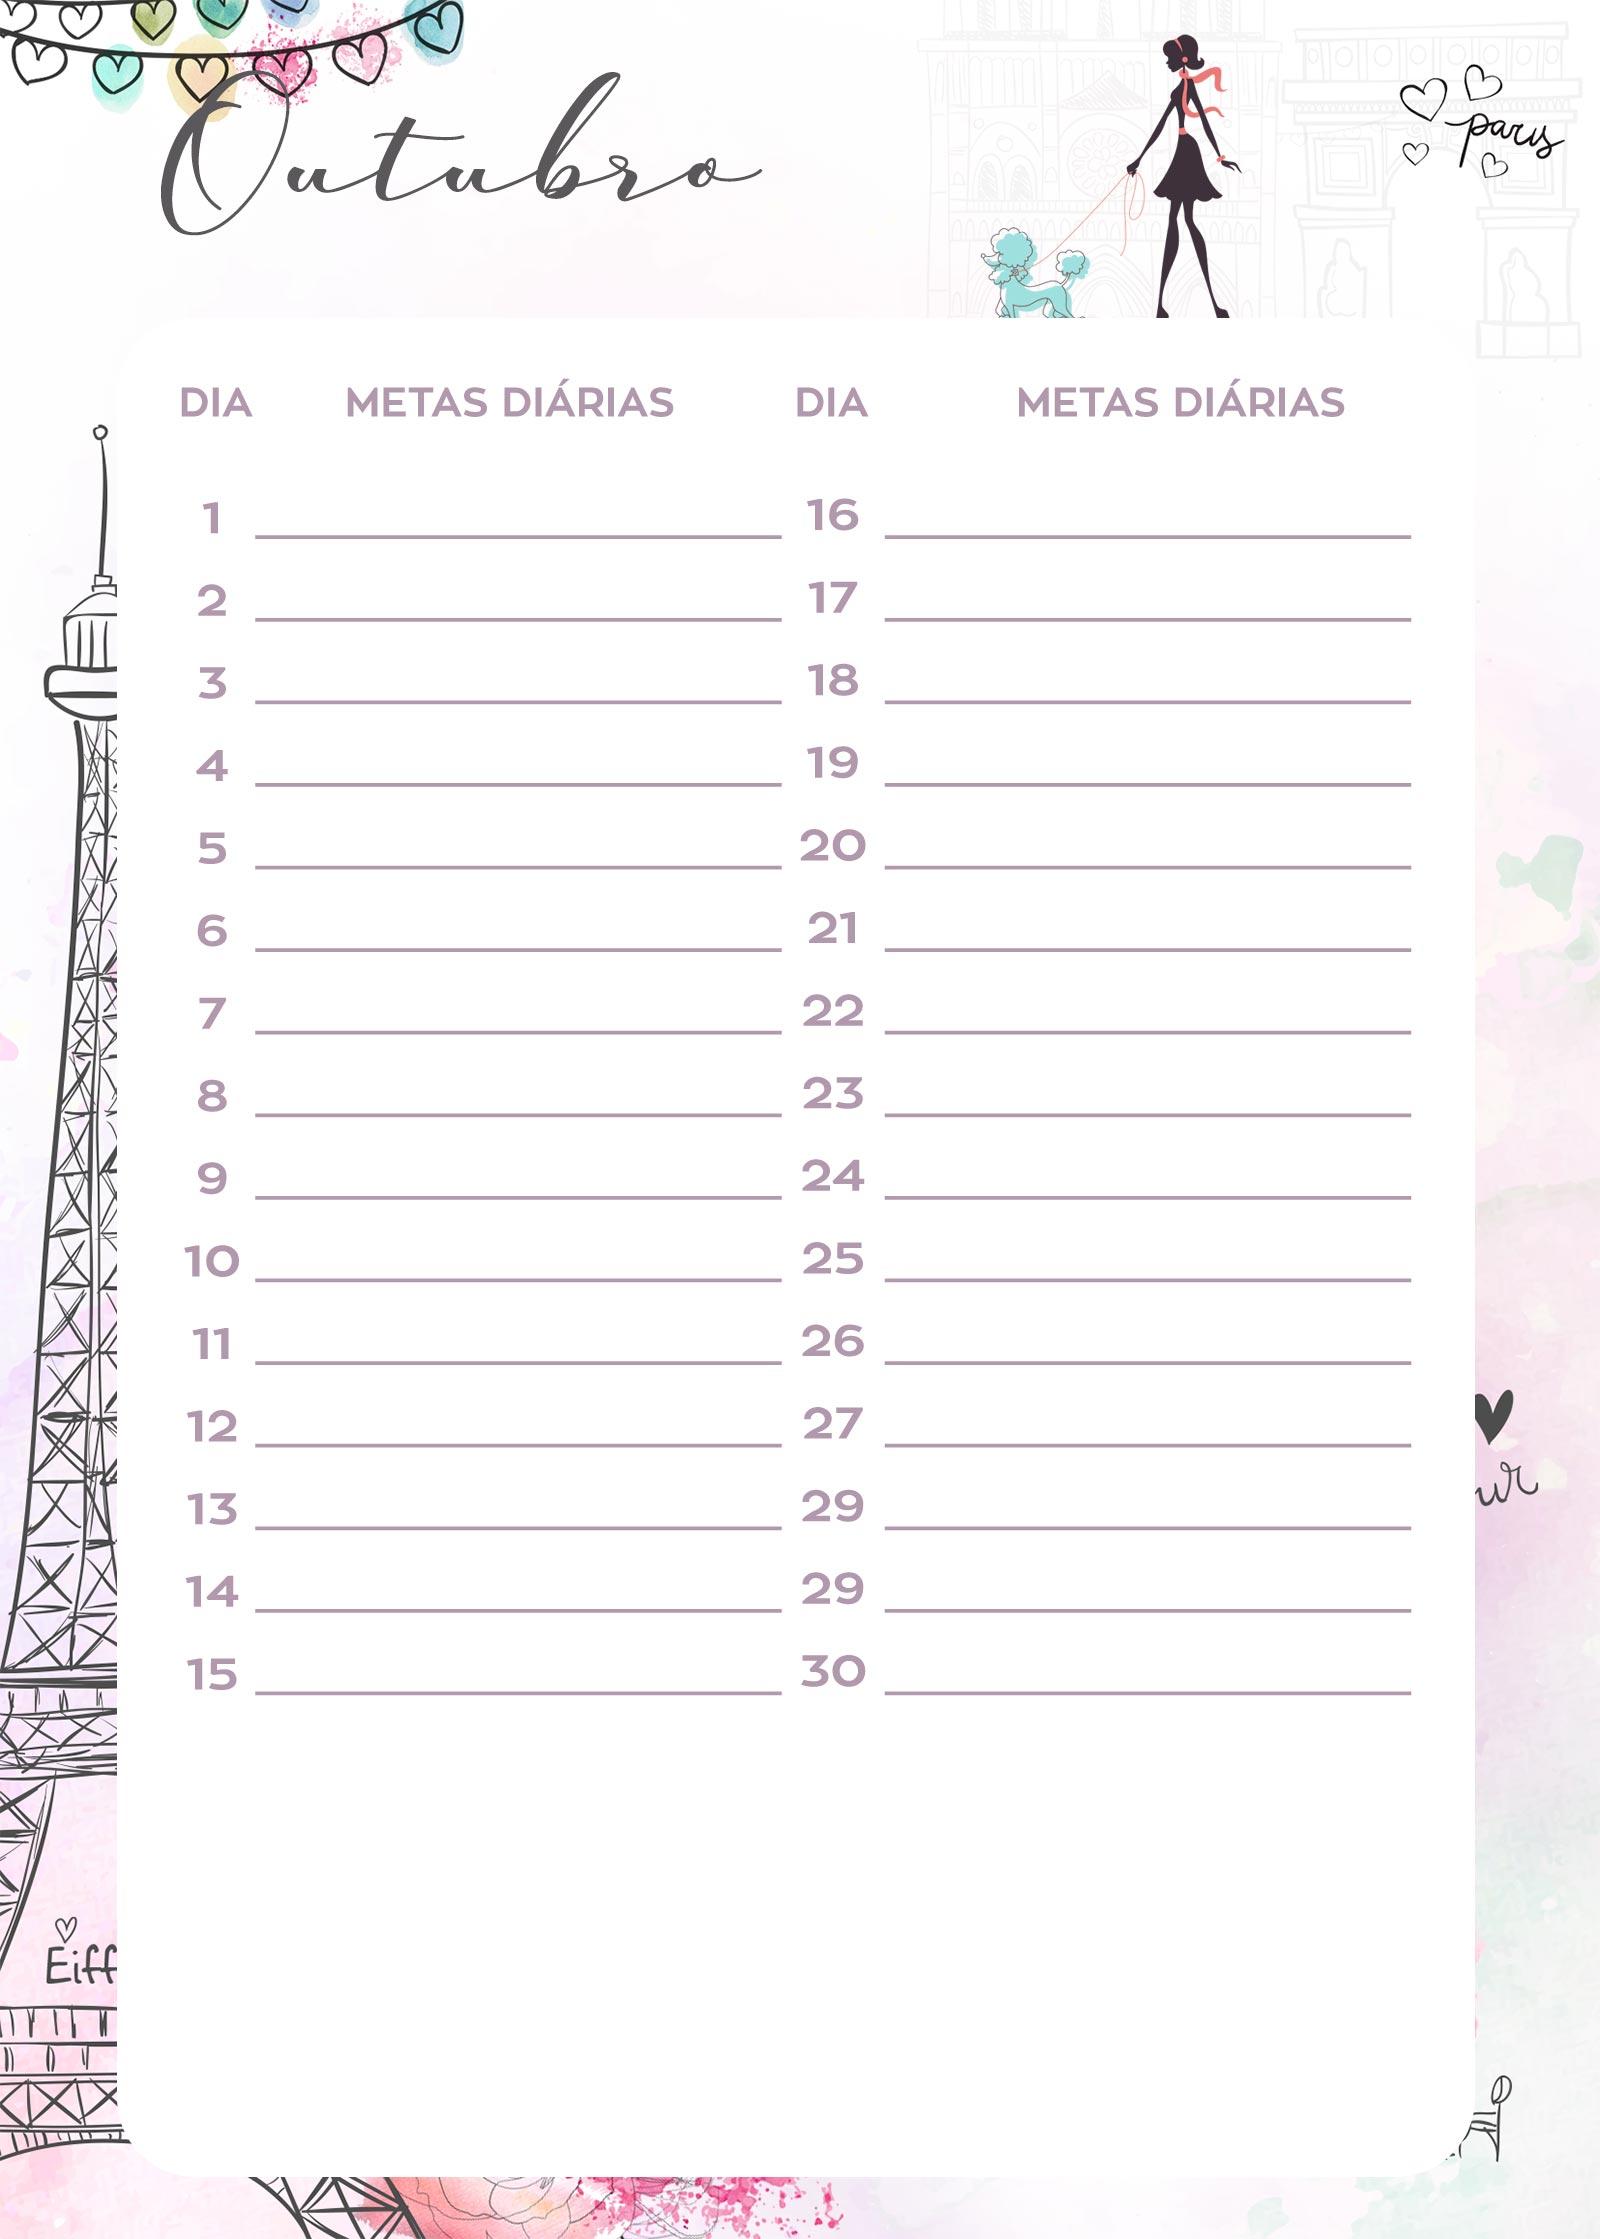 Planner Paris metas diarias outubro